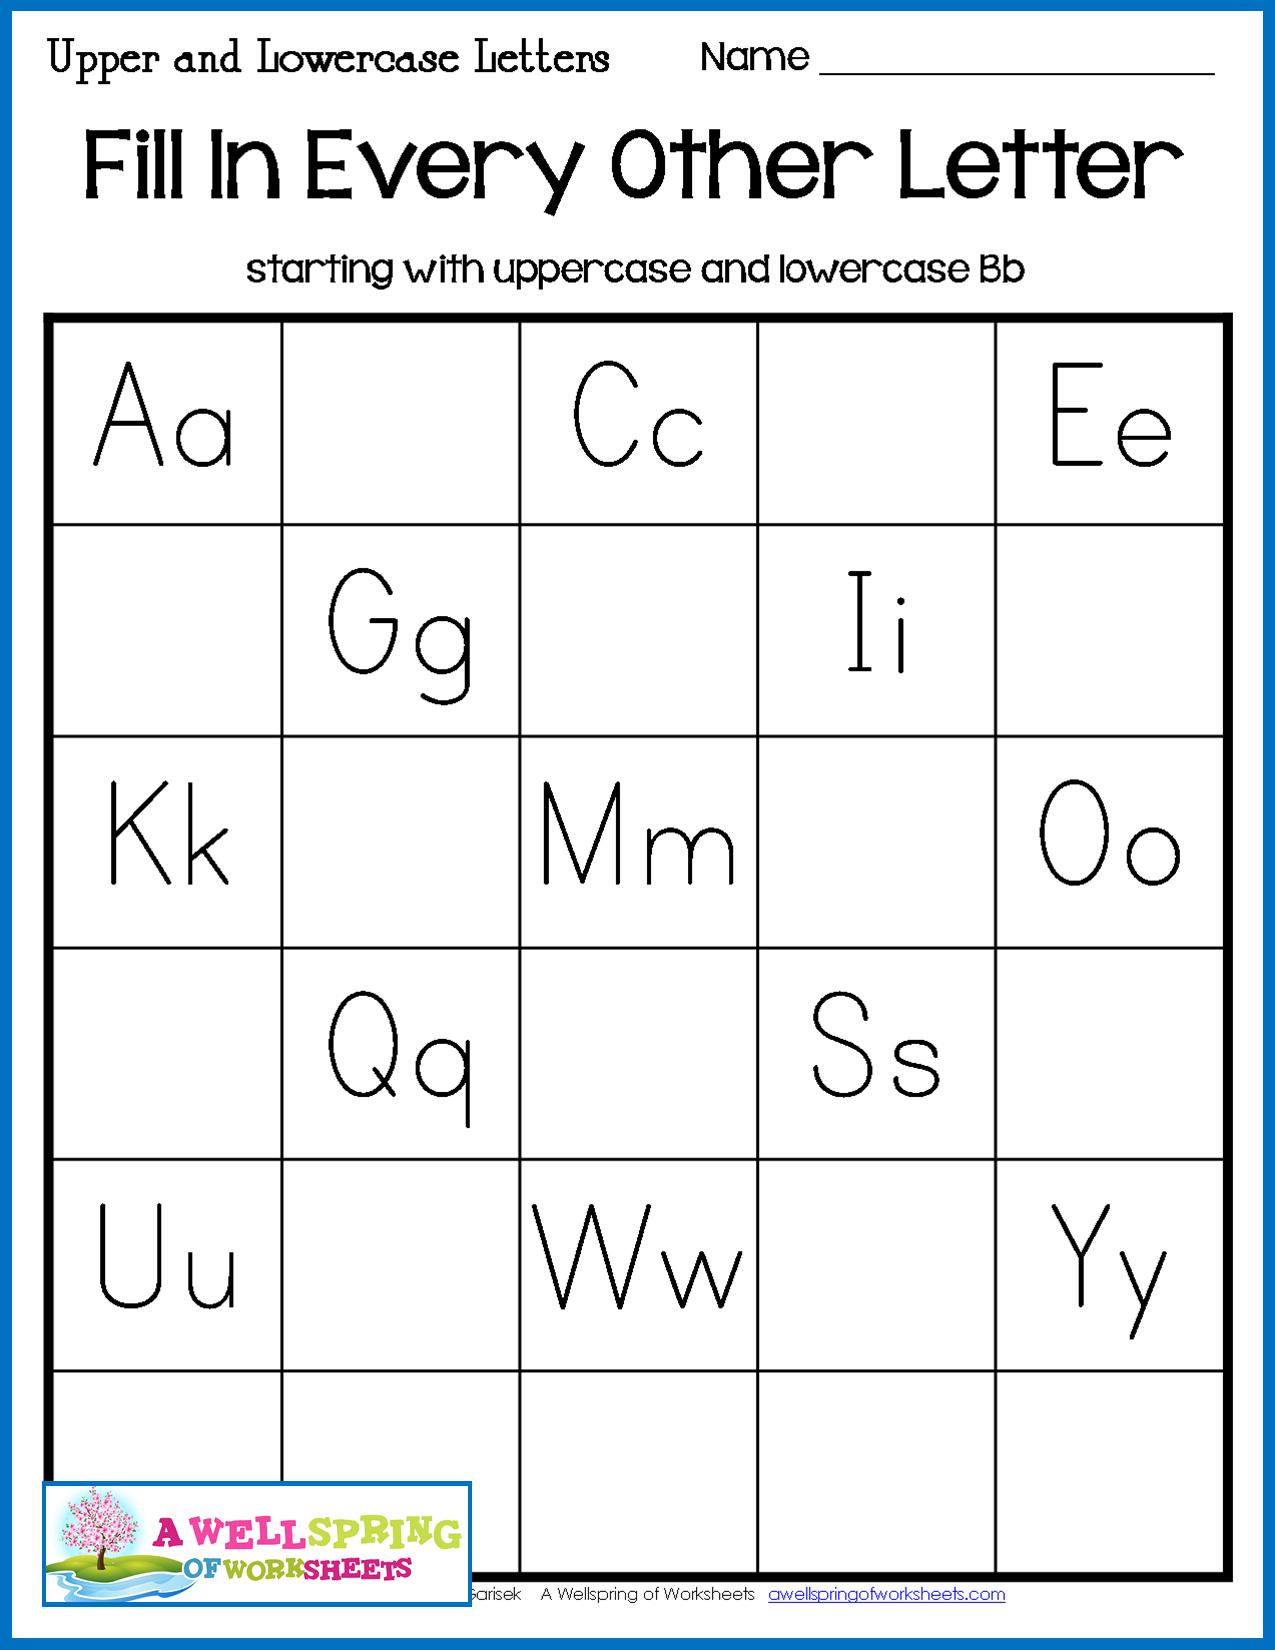 Missing Letters Worksheets | English Worksheets For with Alphabet Sequencing Worksheets For Kindergarten